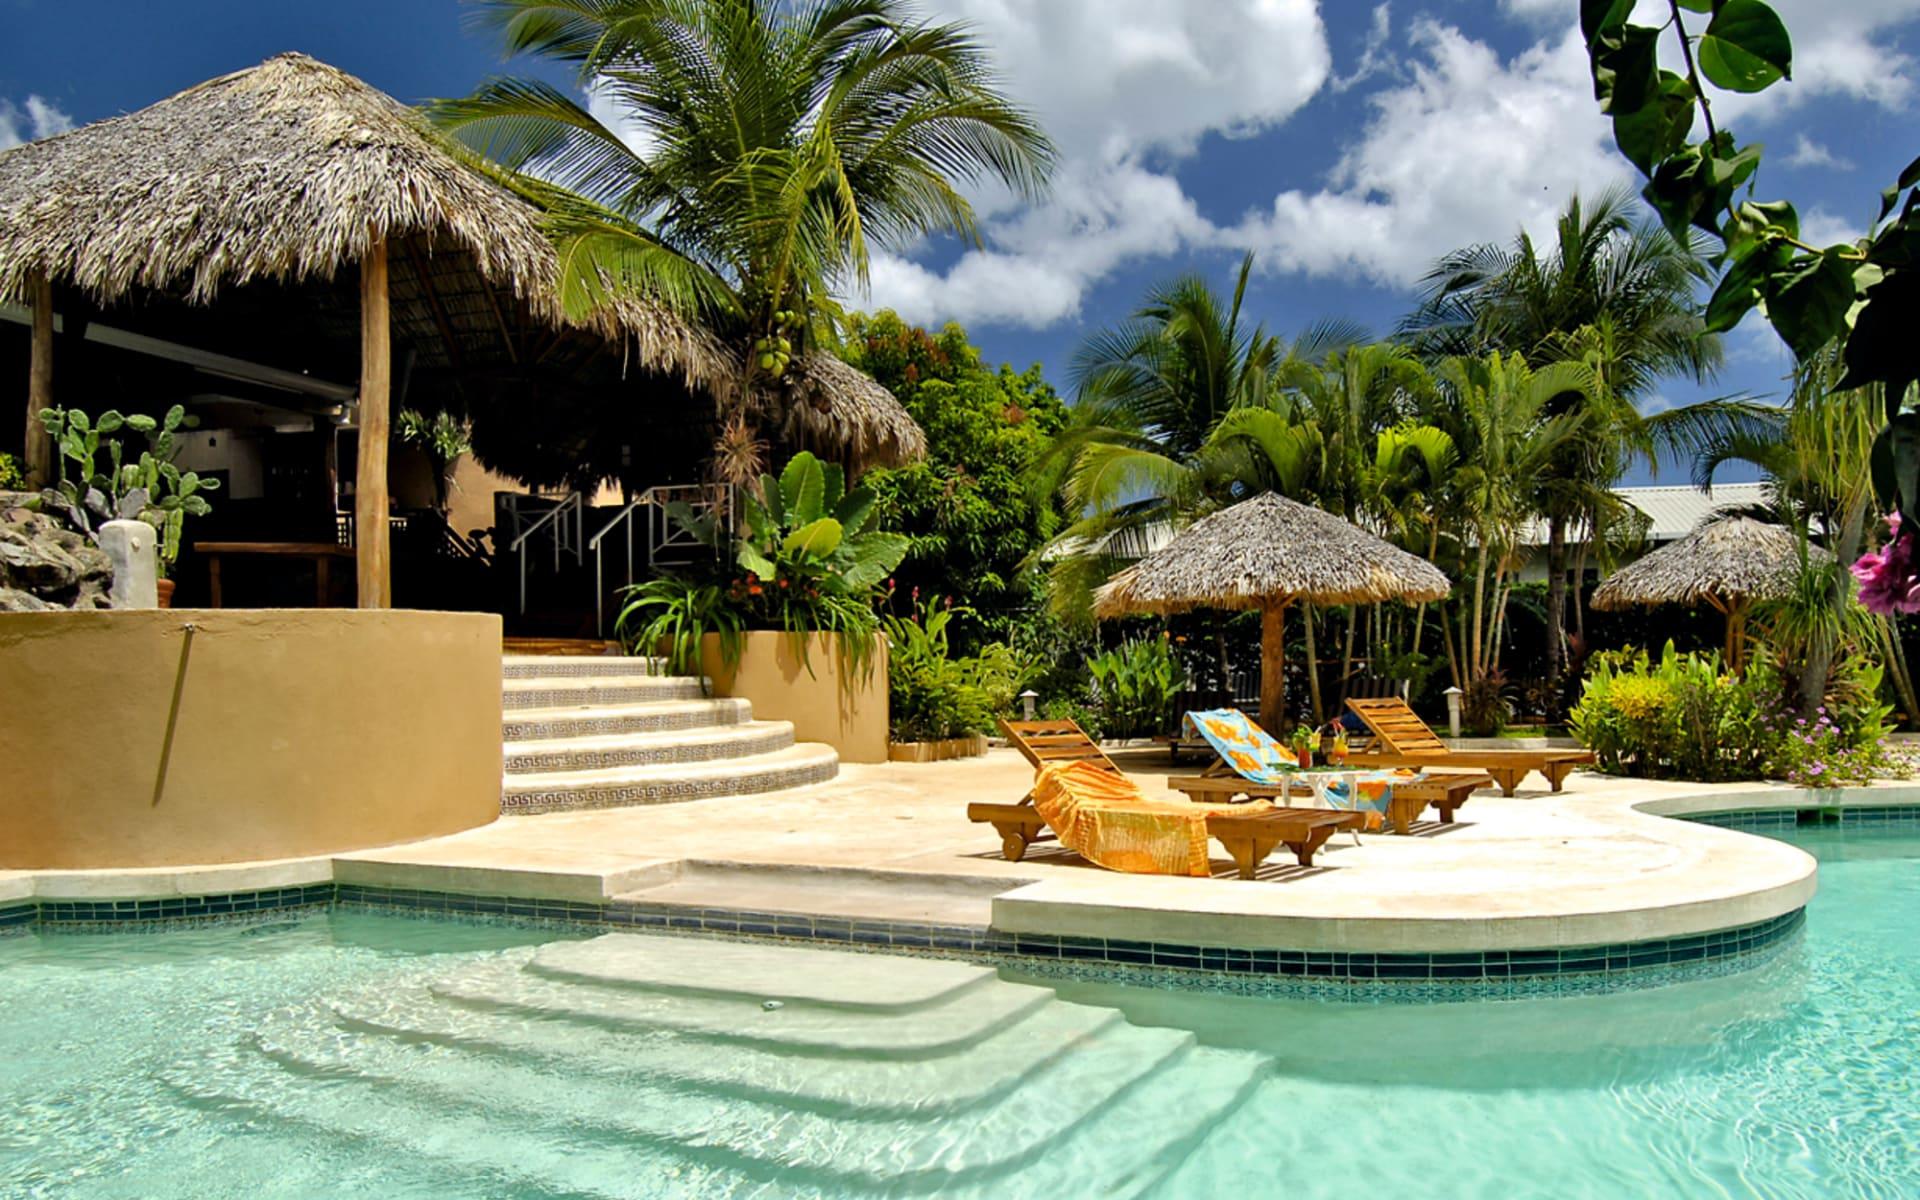 Jardin del Eden in Playa Tamarindo: pool jardin del eden pool liegen hütte